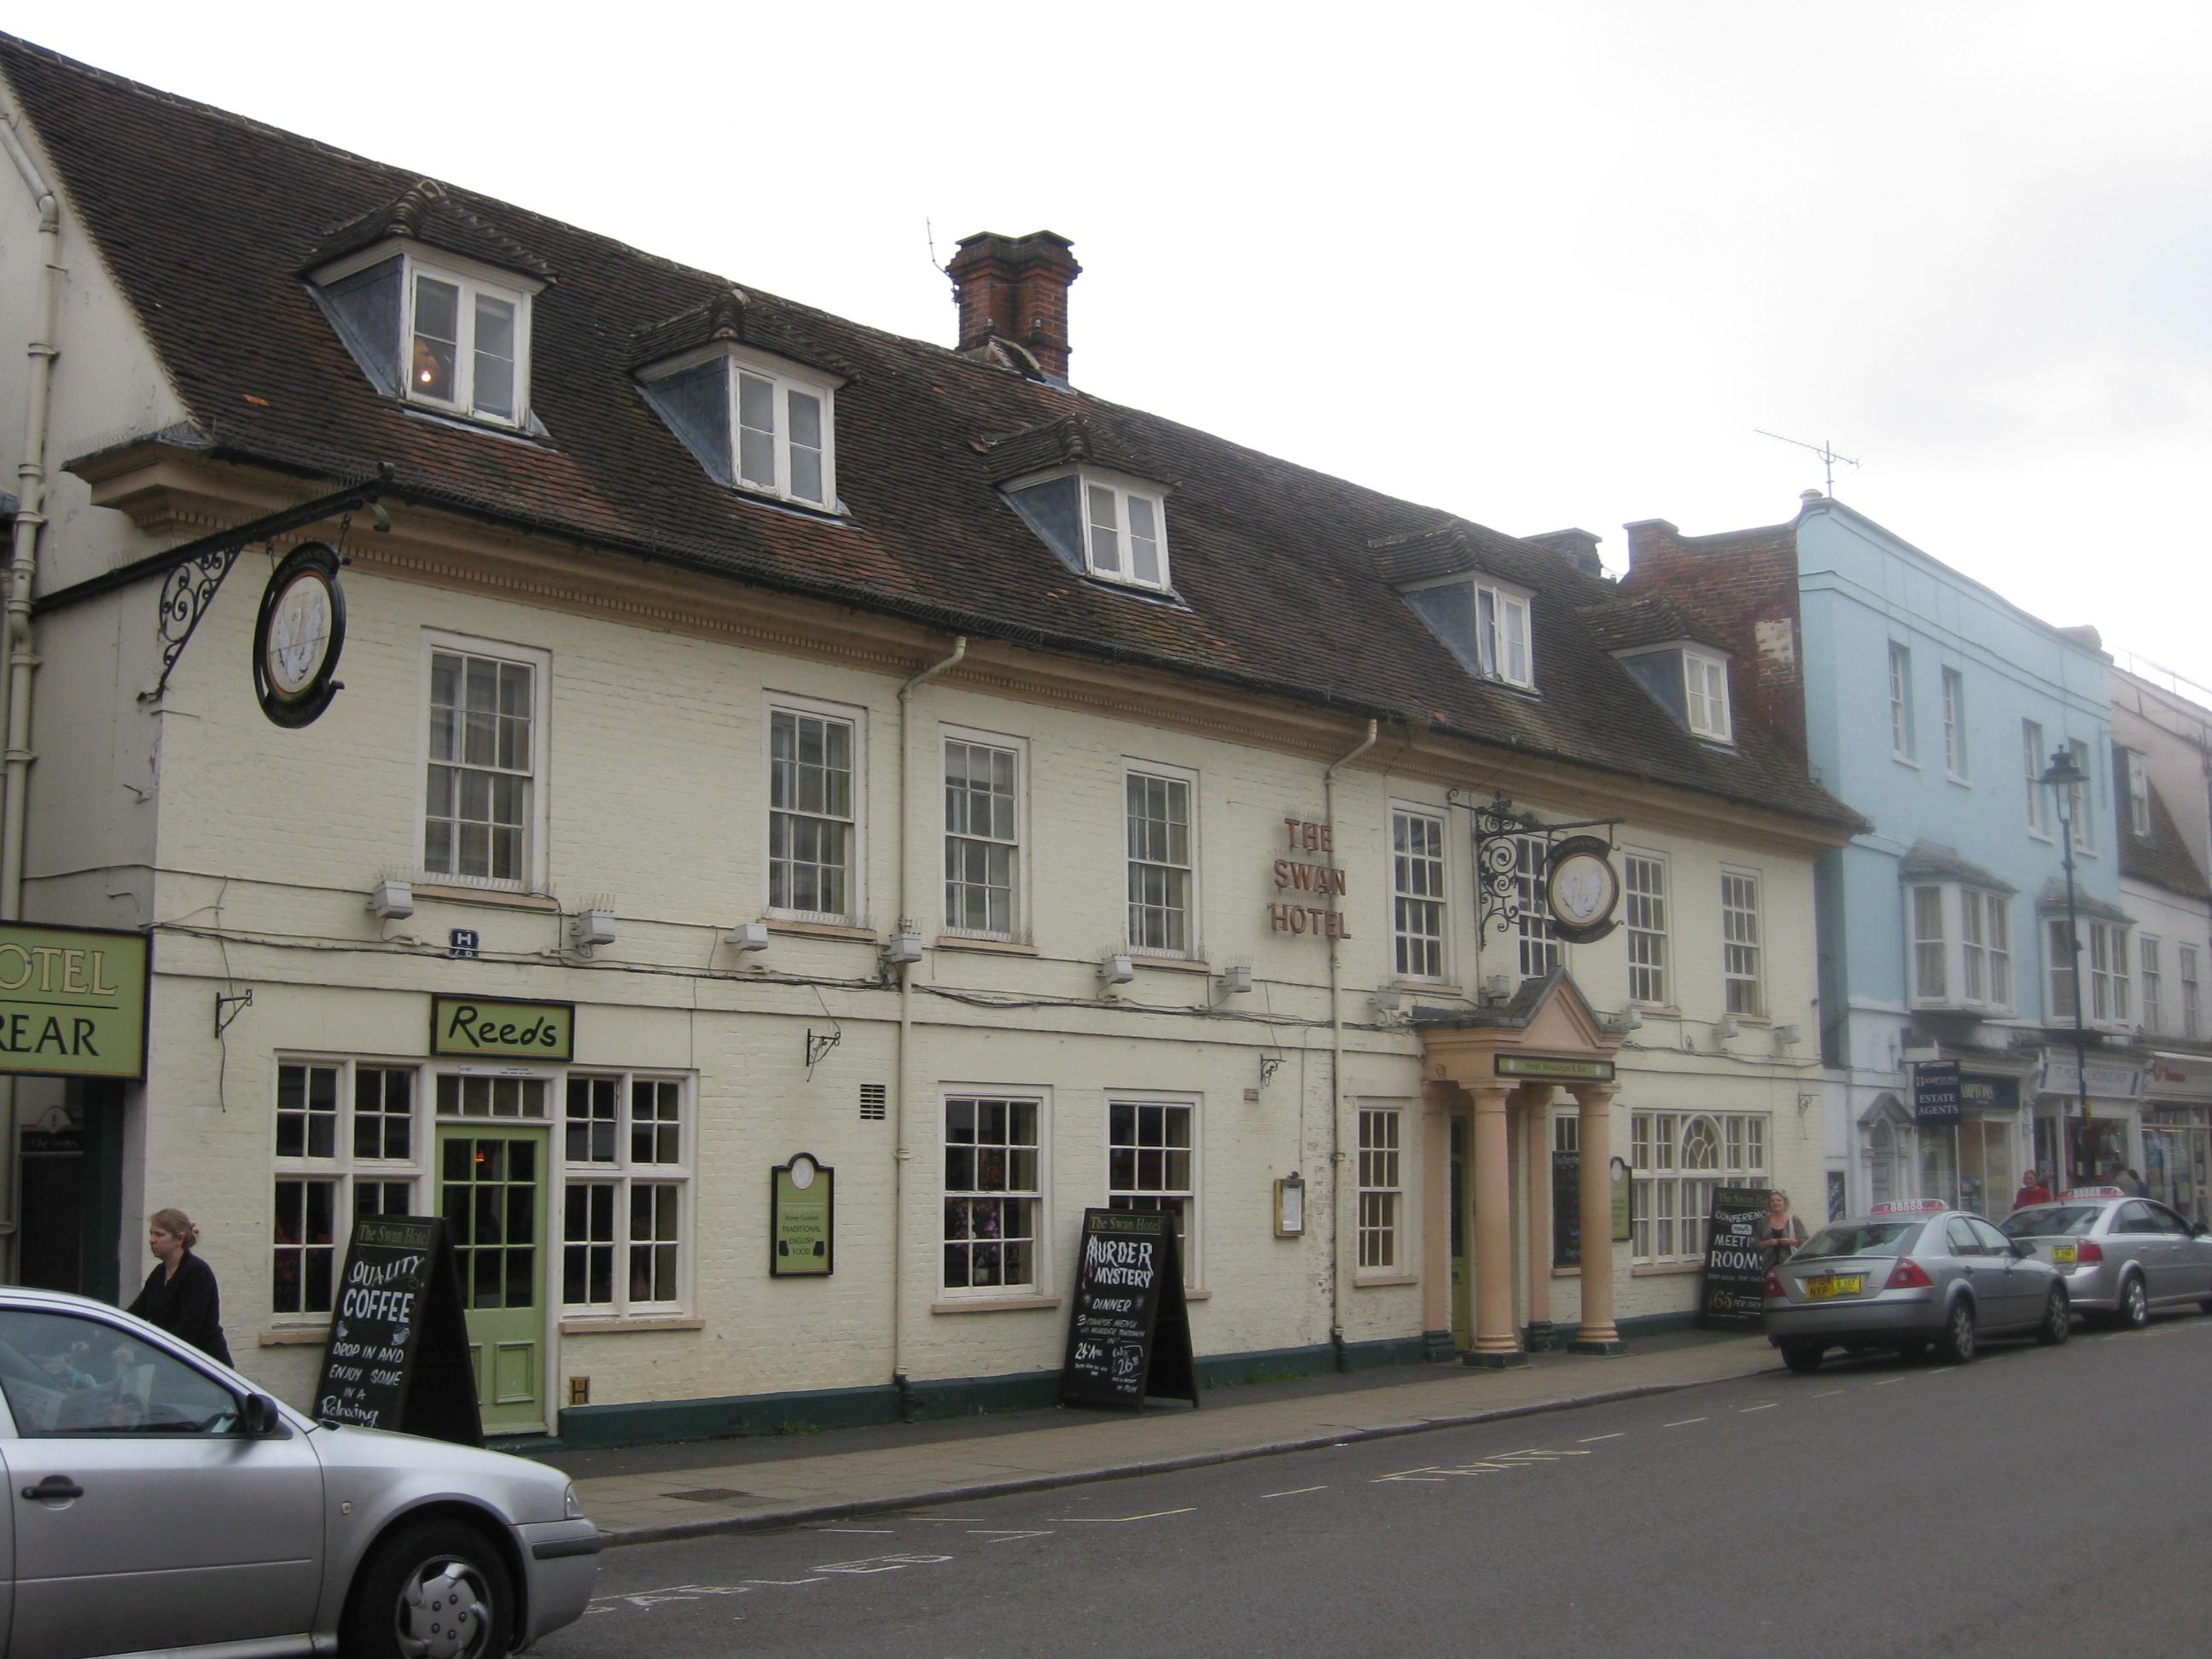 The Swan Inn of Alton